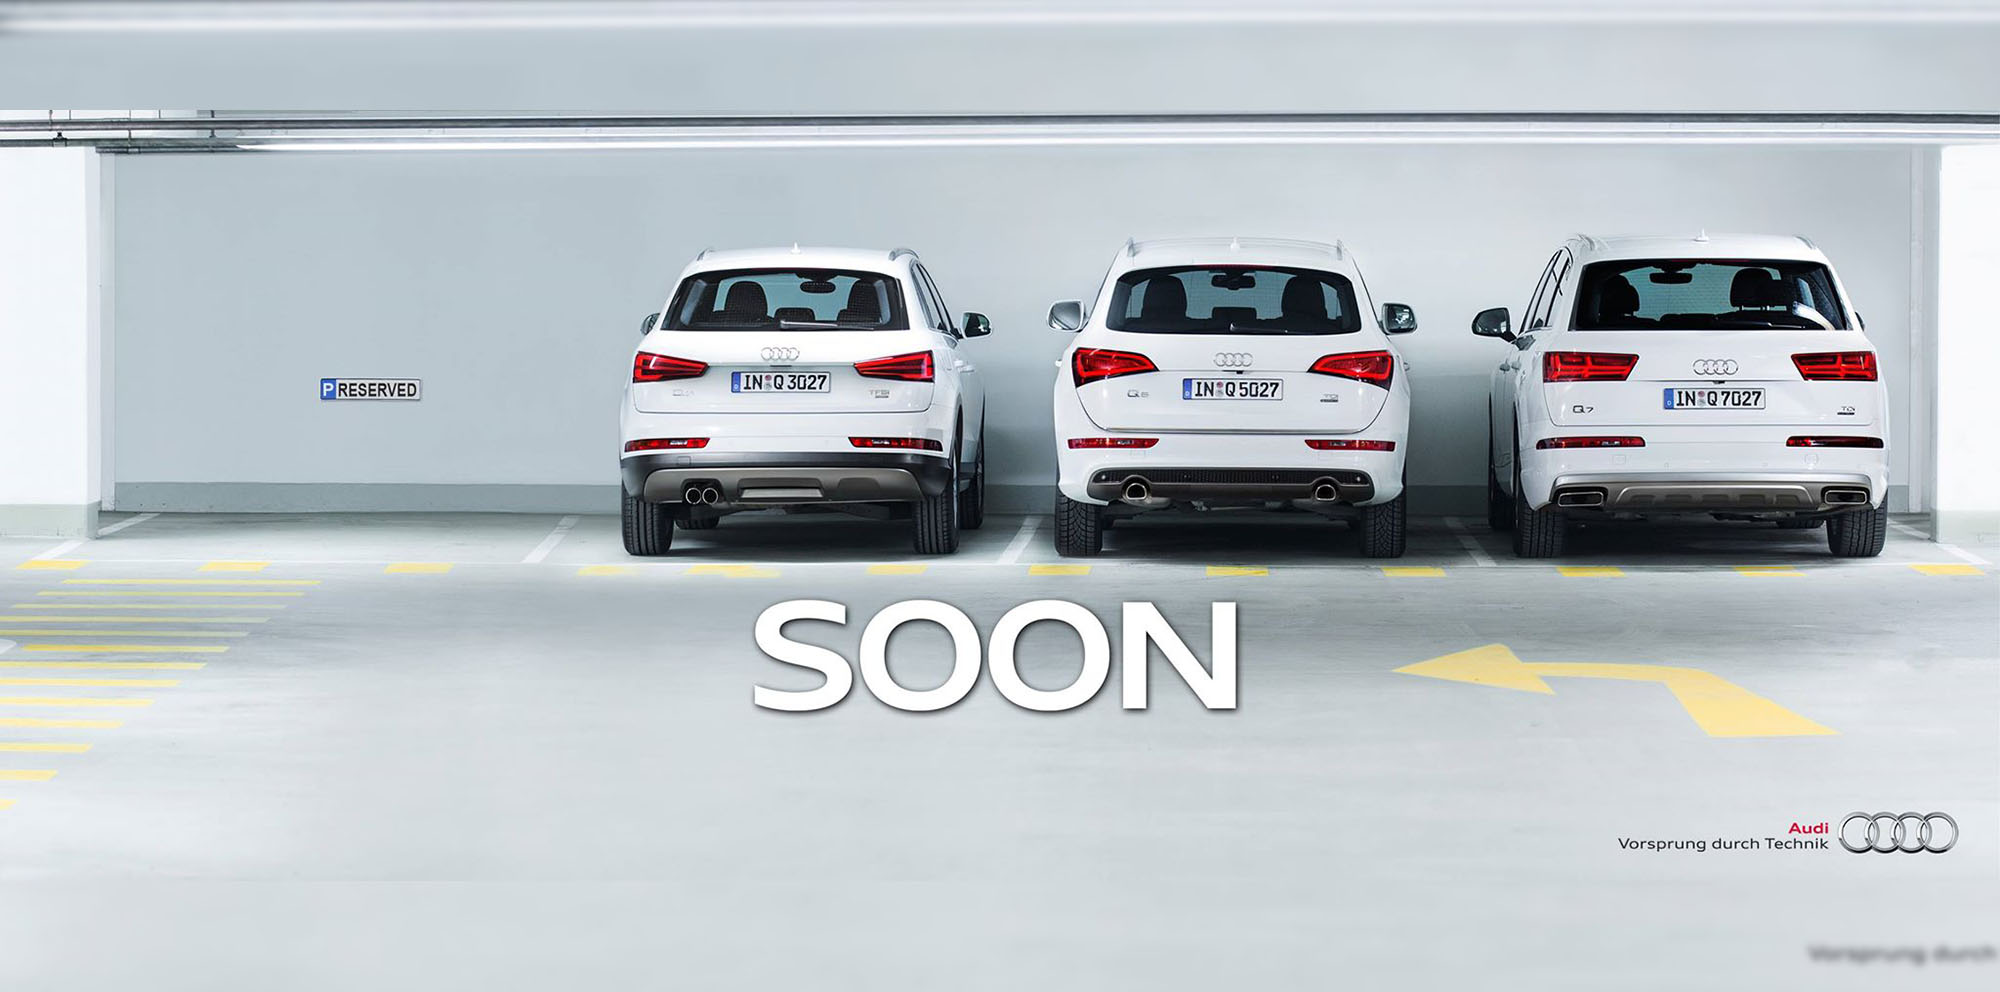 Audi Q2 soon